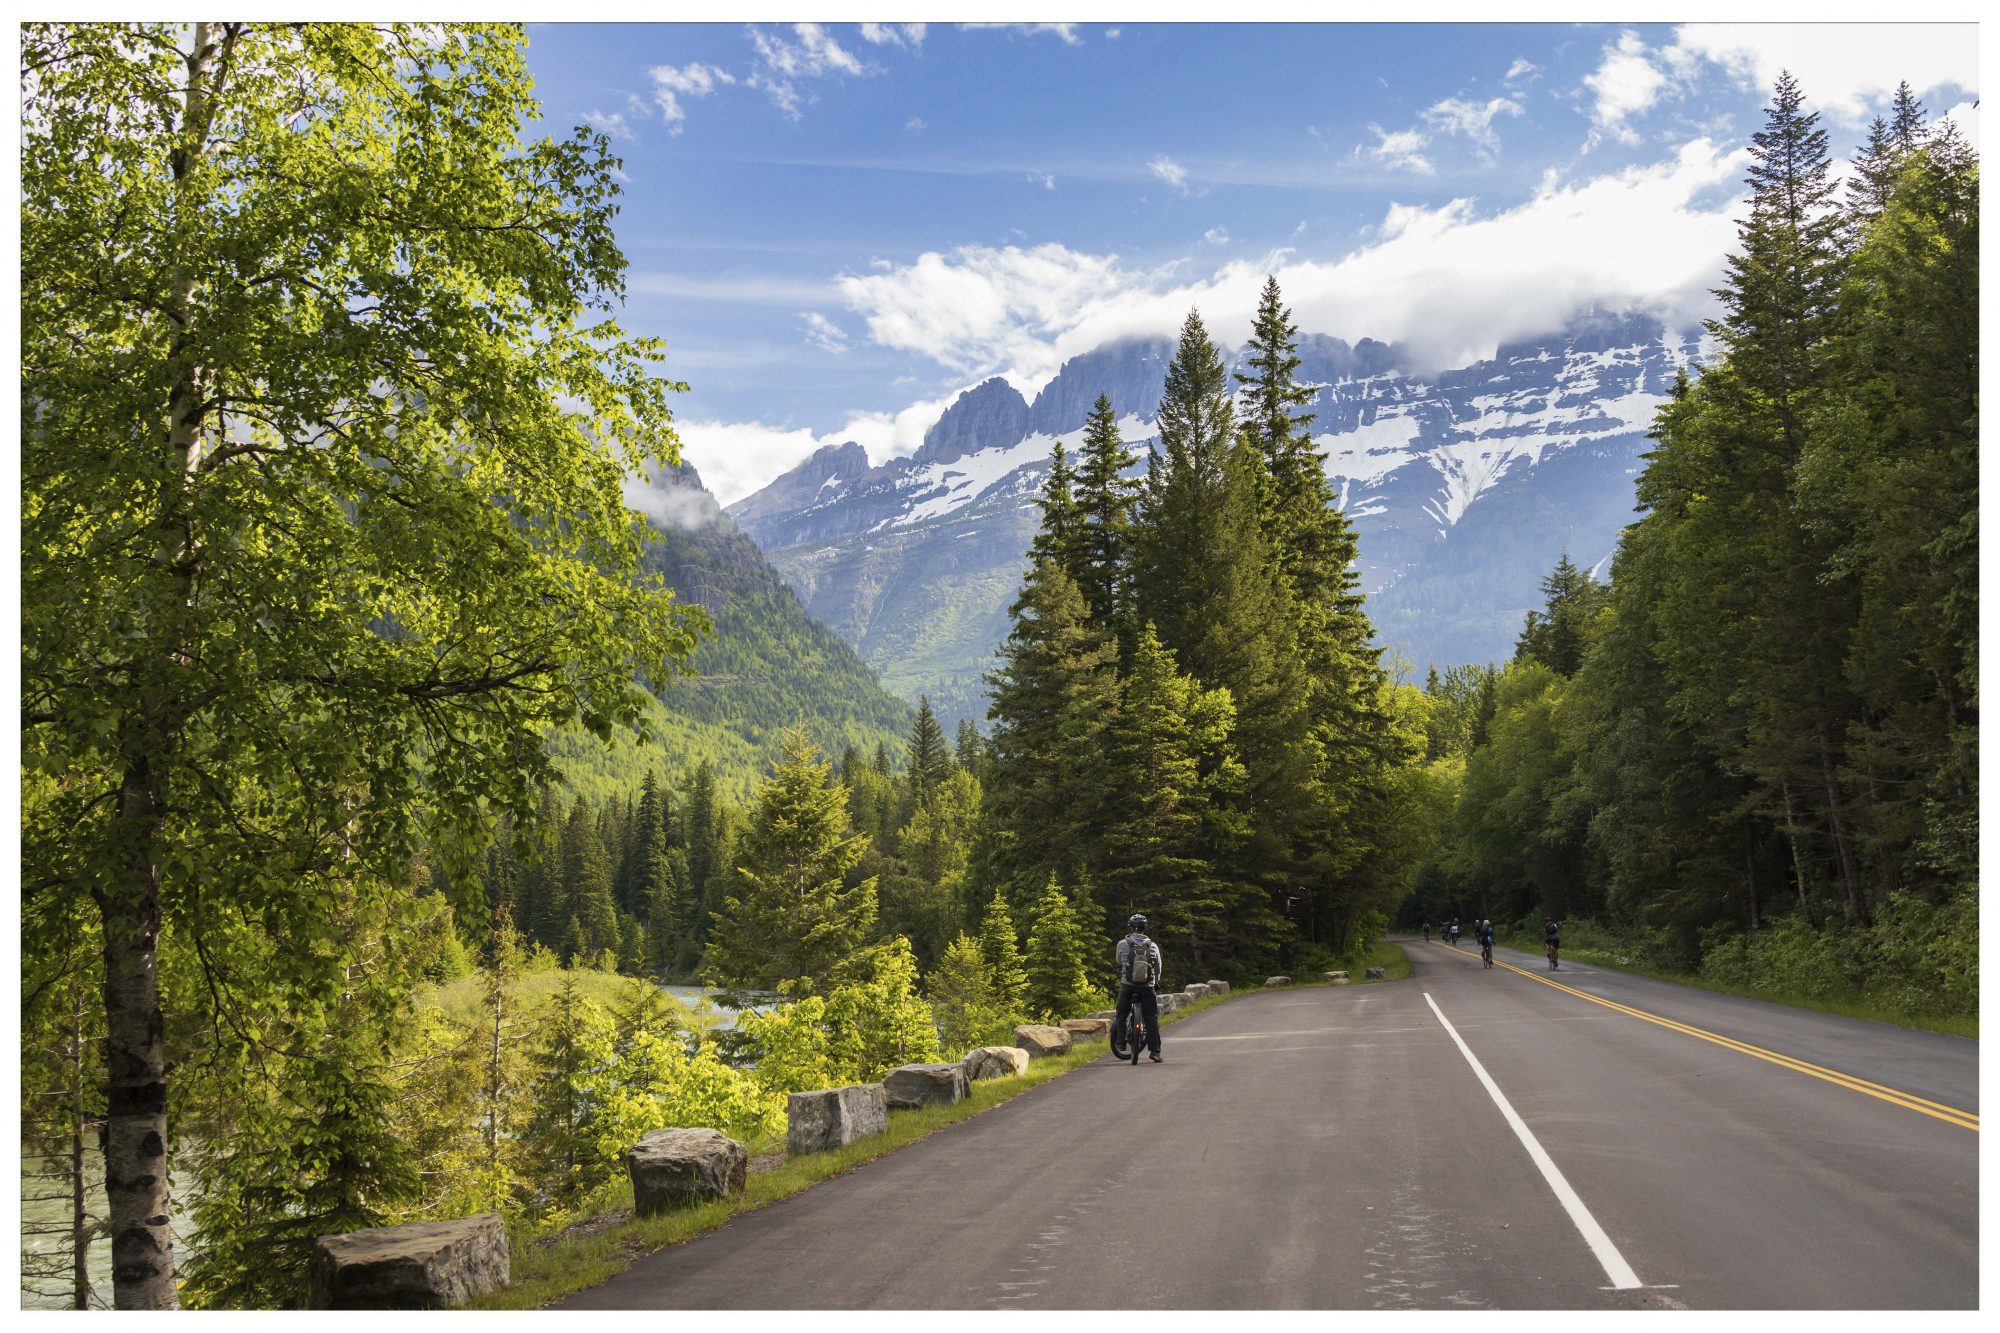 HA Road to sun bike 2 c